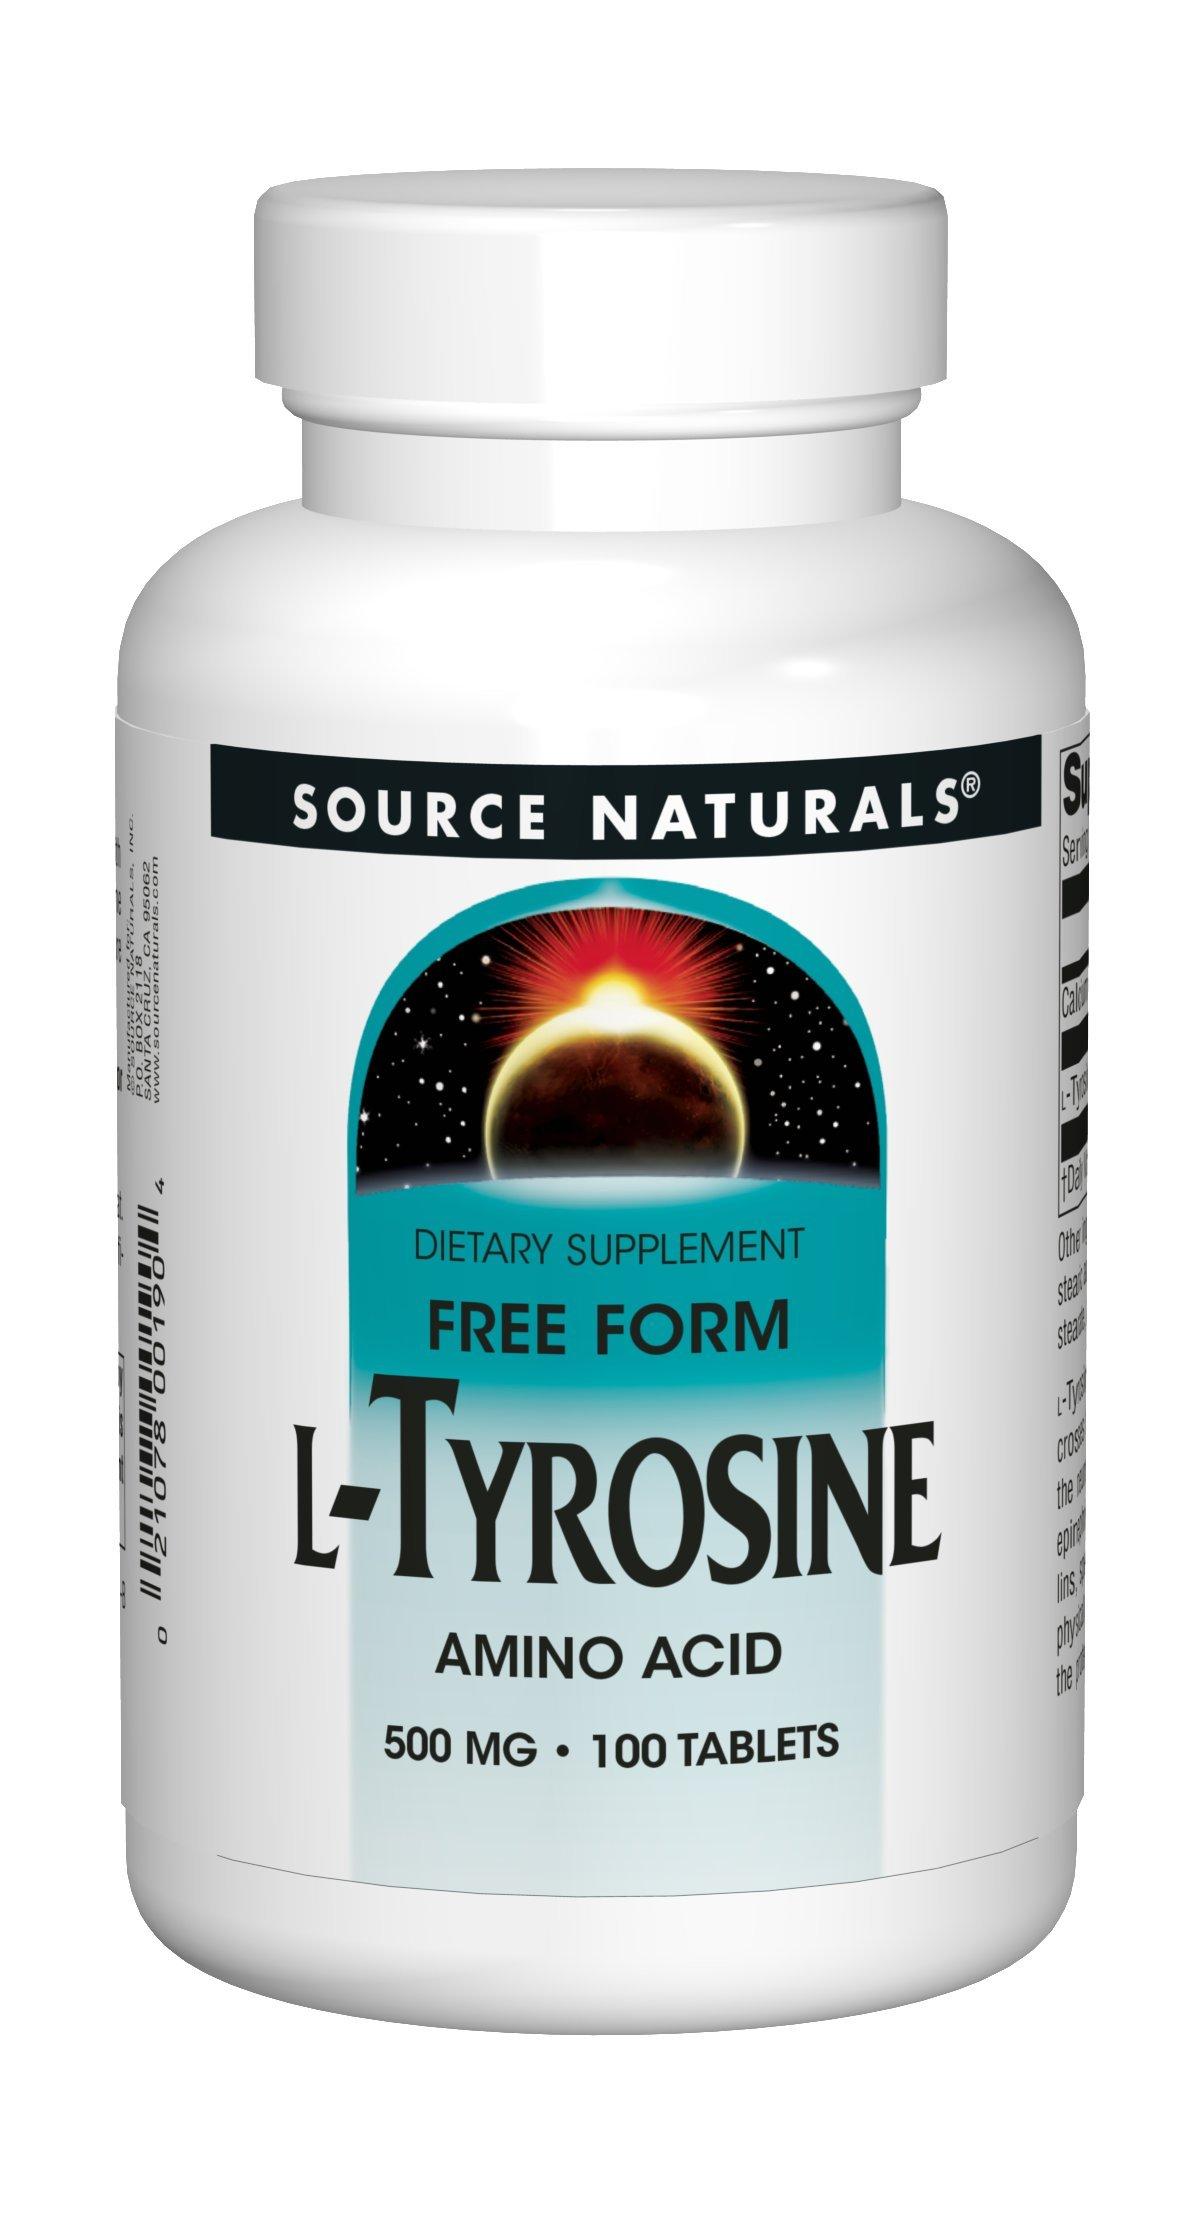 Source Naturals L-Tyrosine 500mg Free Form Amino Acid - 100 Tablets (Pack of 3)